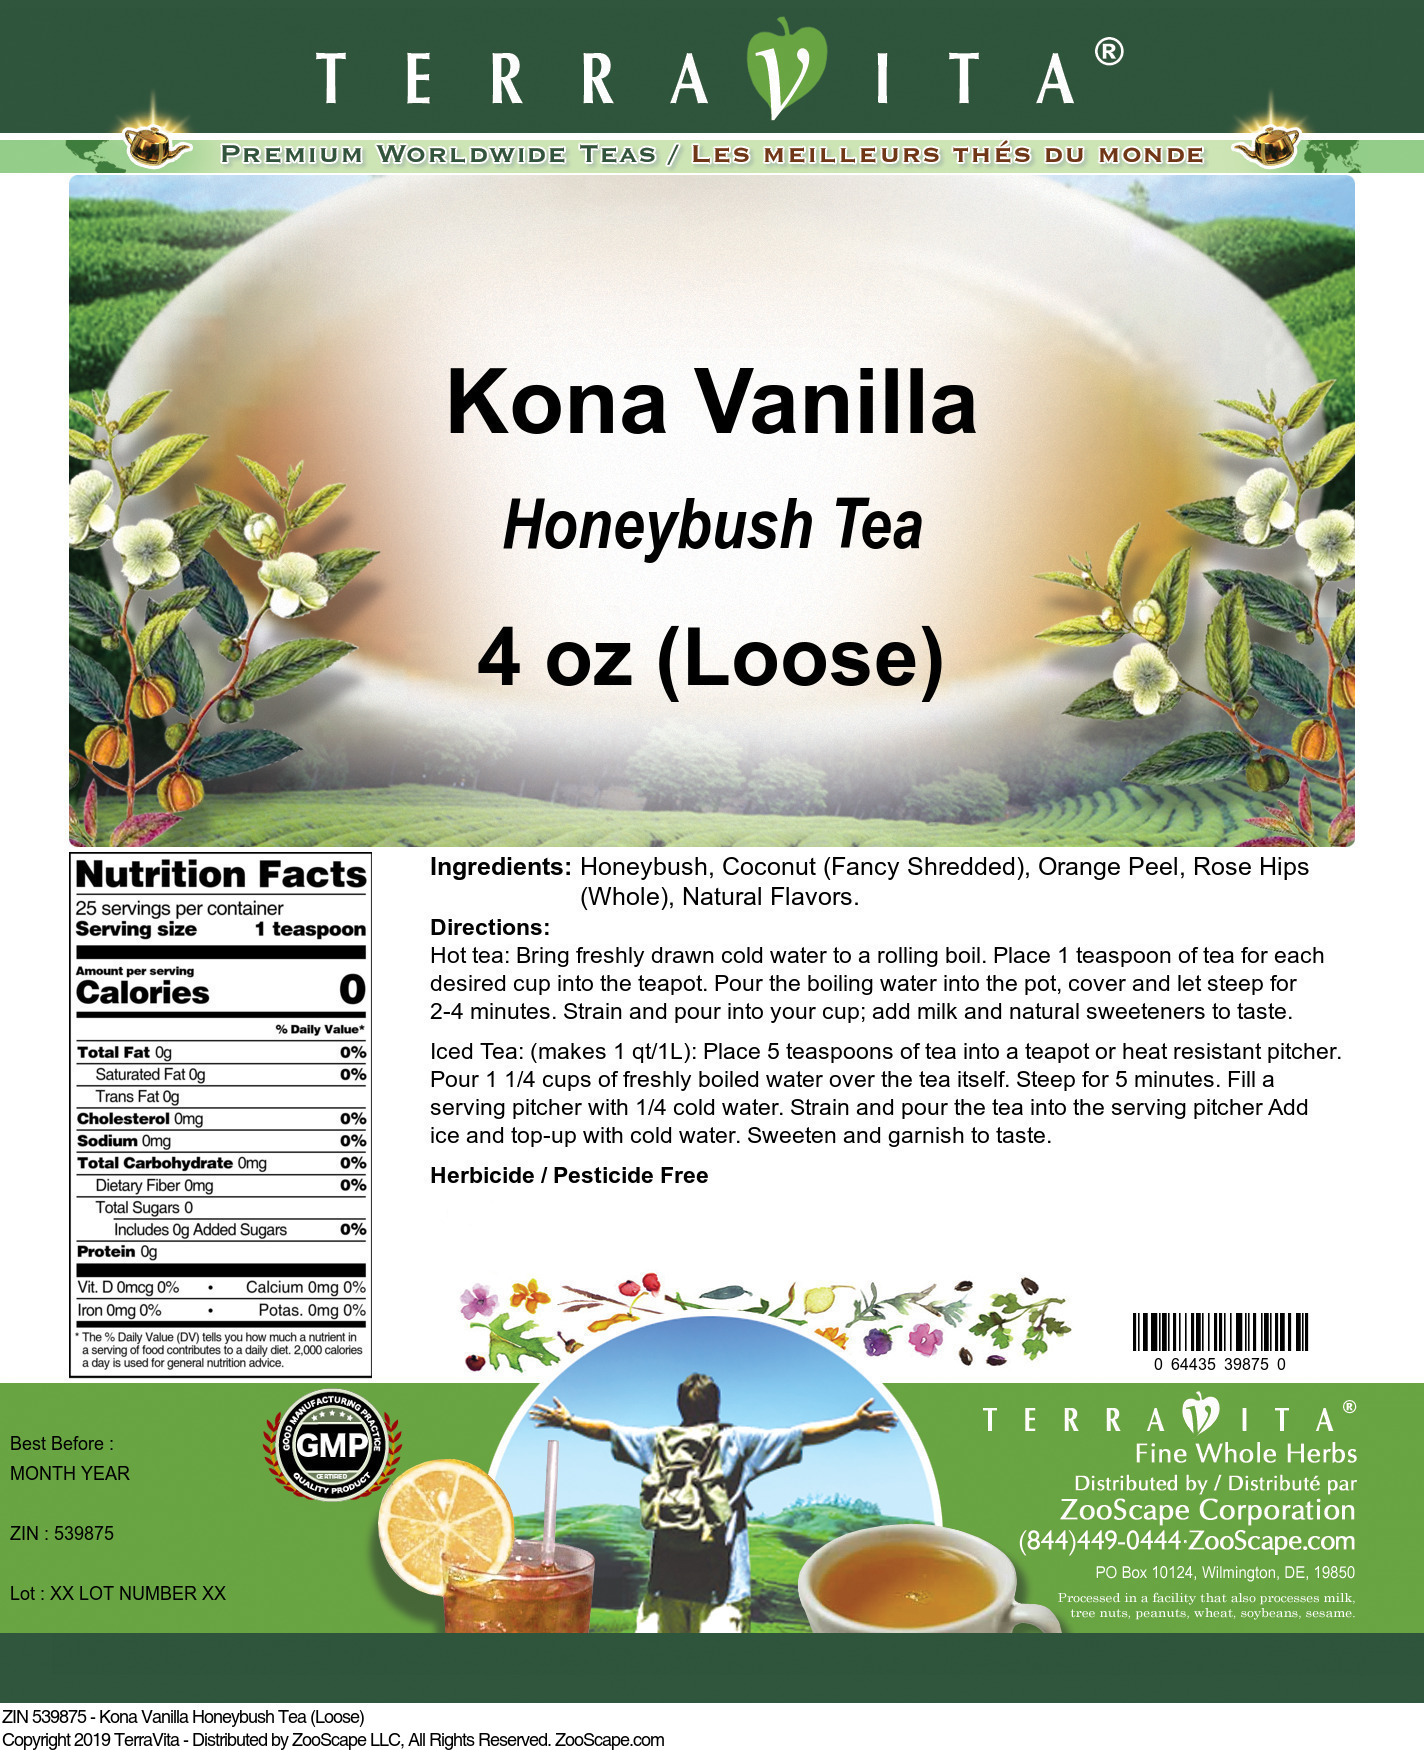 Kona Vanilla Honeybush Tea